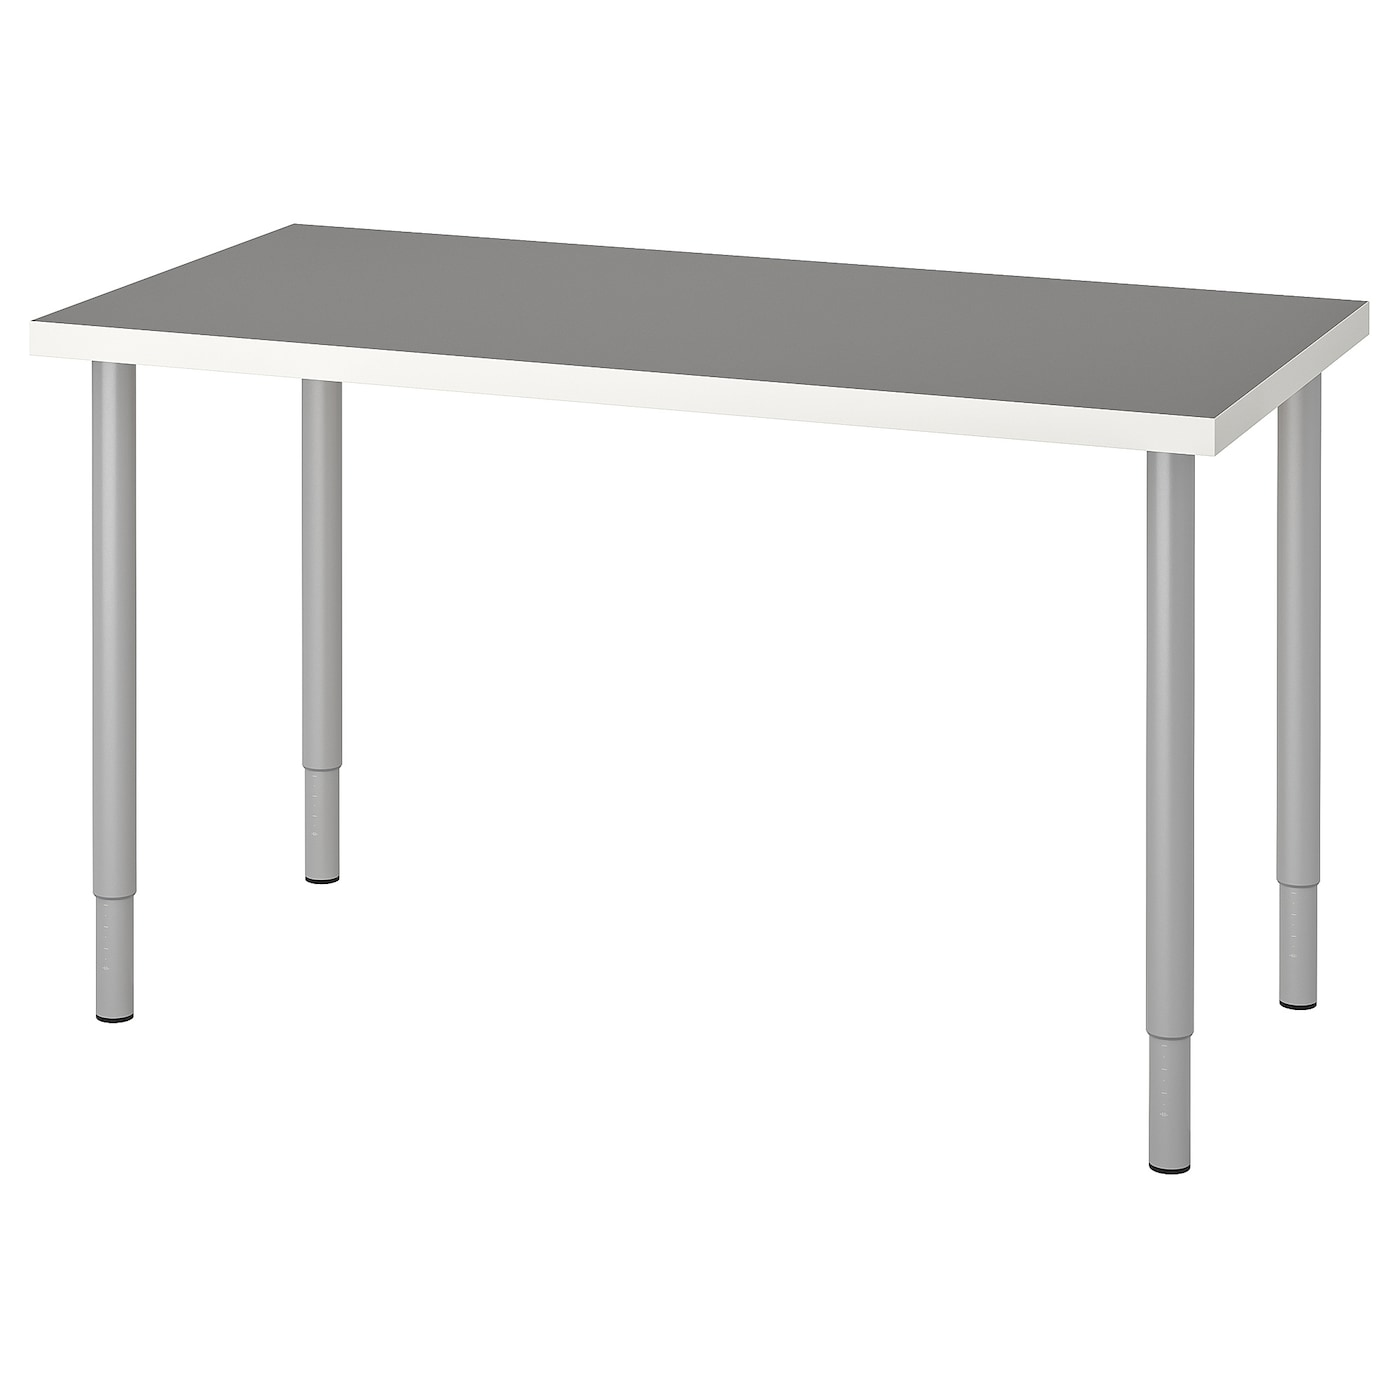 ИКЕА LINNMON / OLOV, Таблица, 093.313.07, светло-серый белый, серебристый, 120x60 см